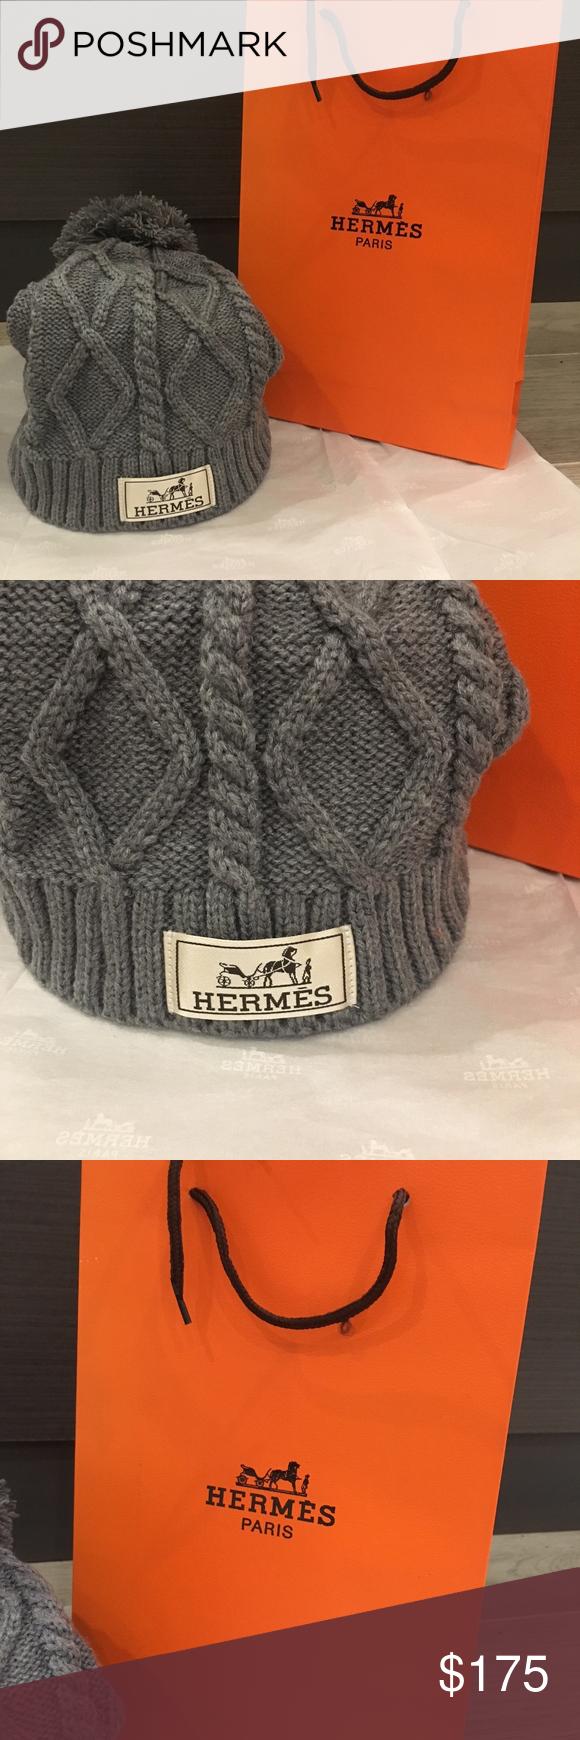 9dd02e46e8c BRAND NEW HERMES VIP POM POM TOQUE WINTER HAT This hat is amazing! Stylish